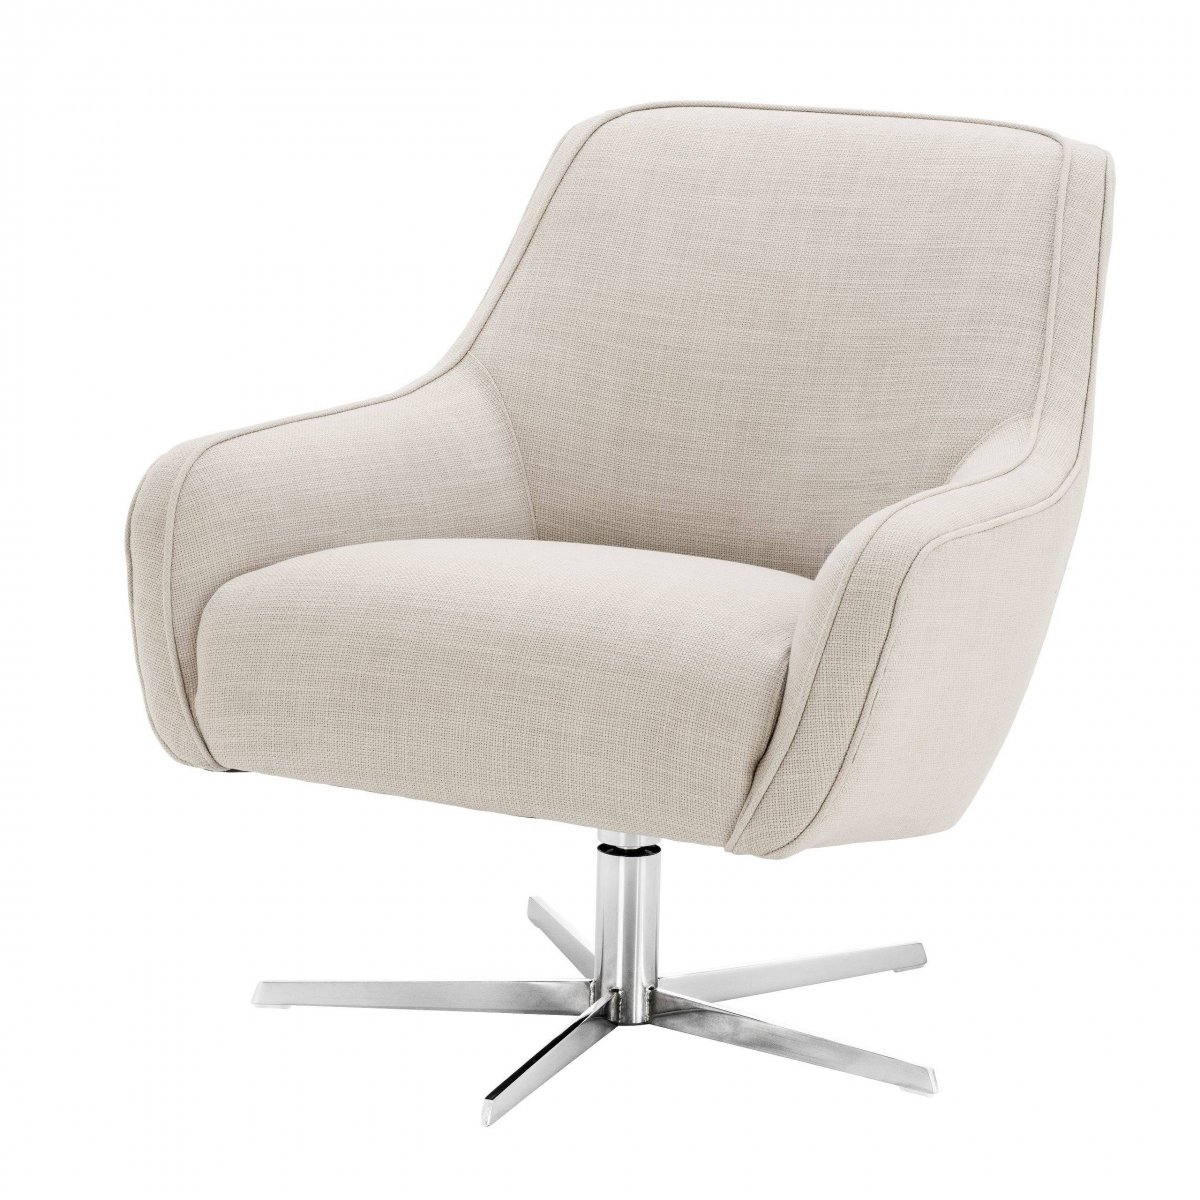 Кресло Eichholtz Swivel Chair Serena Natural  - фото 1